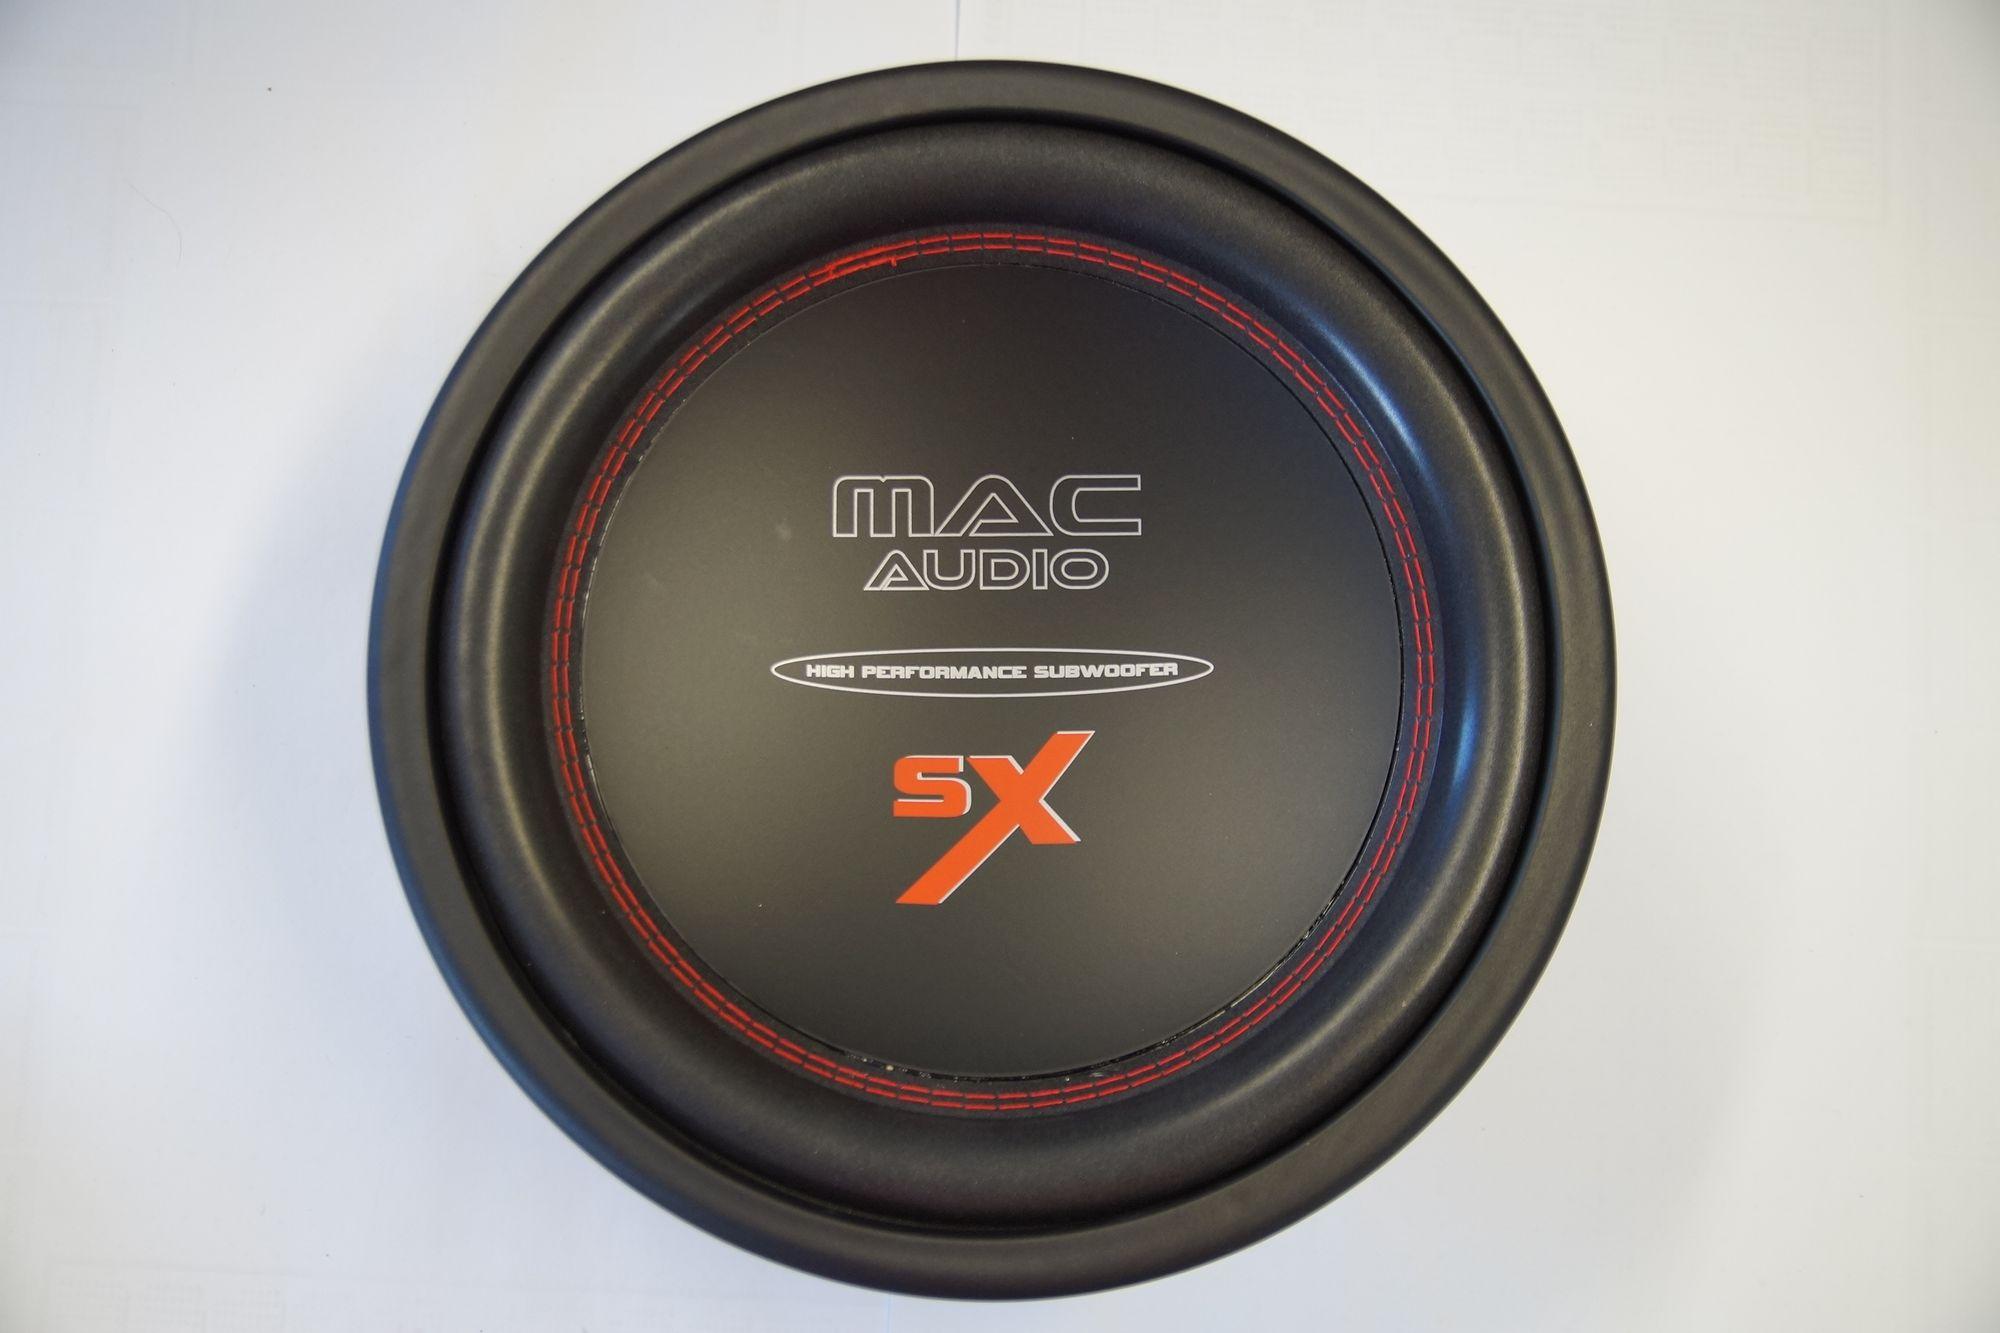 Mac Audio SX 12 Subwoofer Basslautsprecher Tieftöner 30 cm 1000 Watt 001